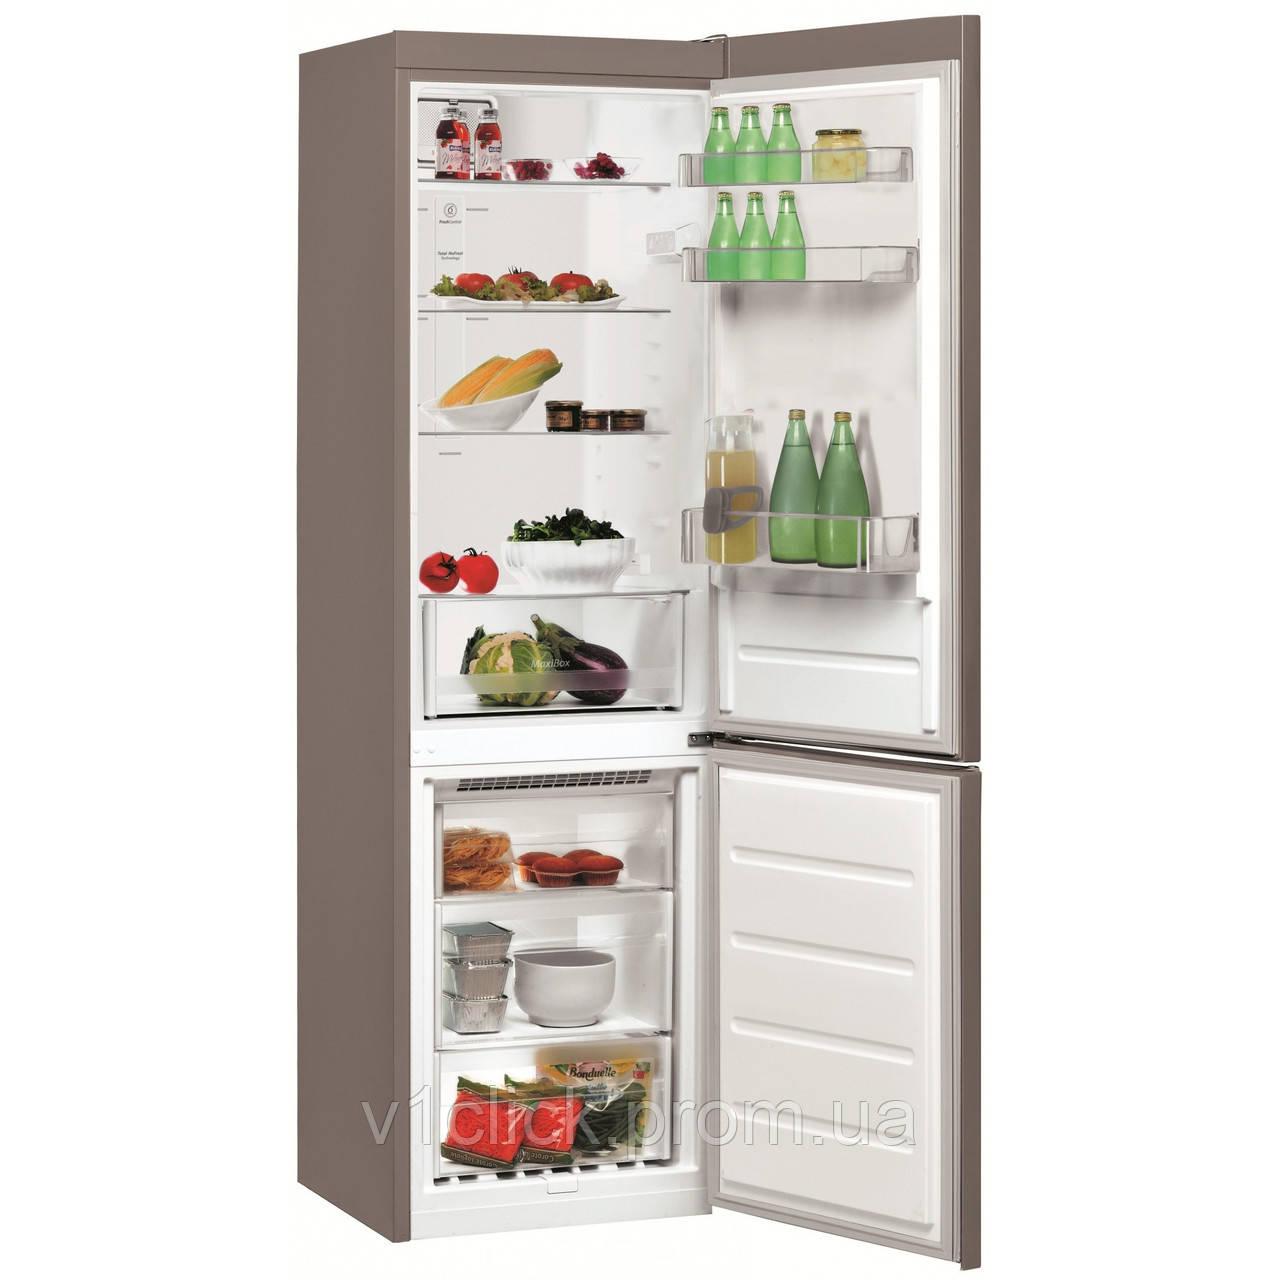 Холодильник Whirlpool BSNF 8101